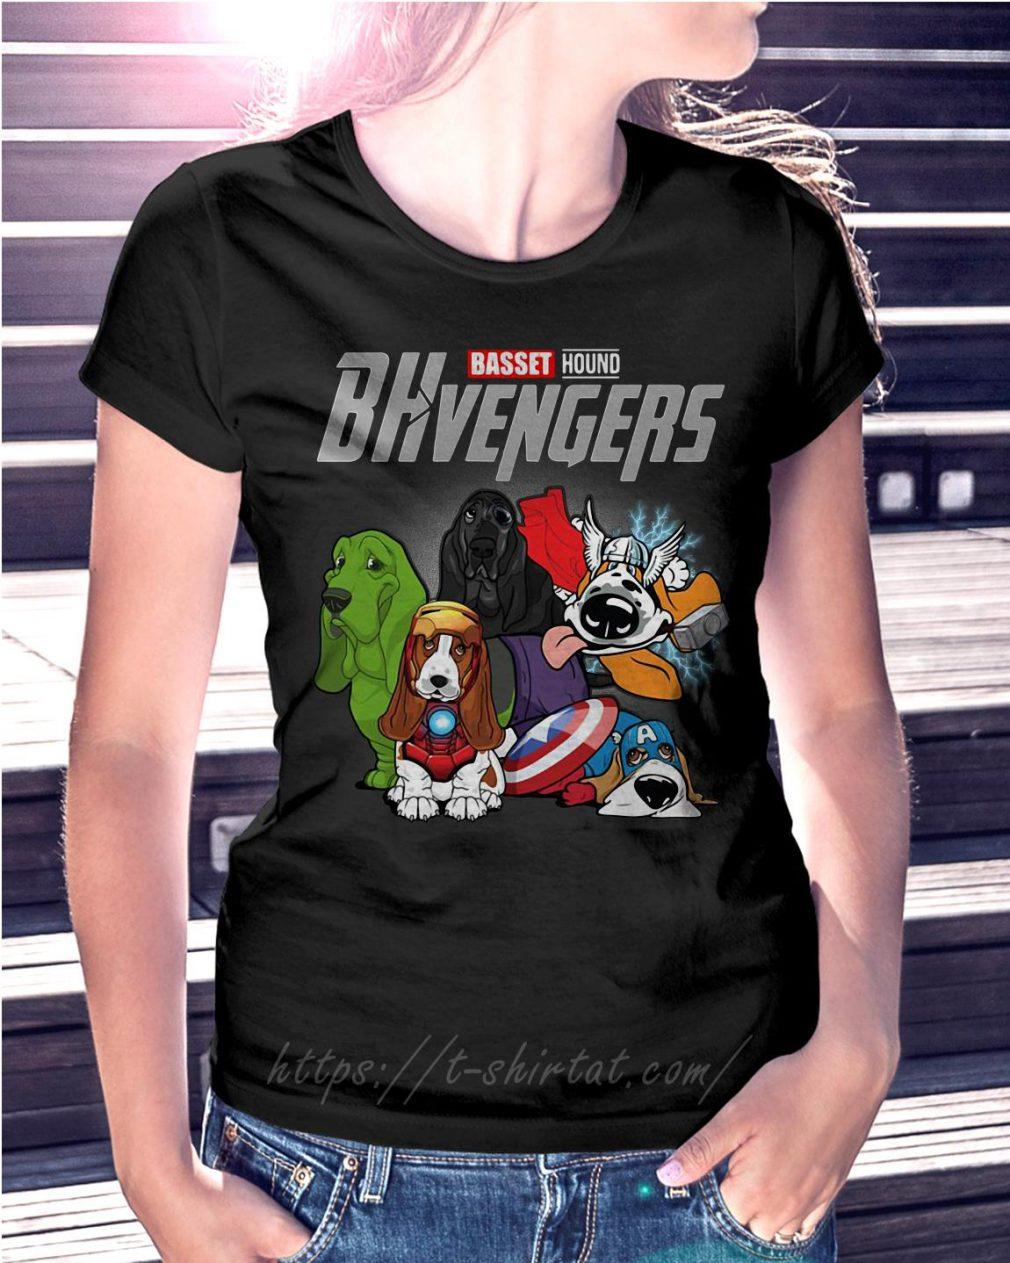 Marvel Basset hound BHvengers